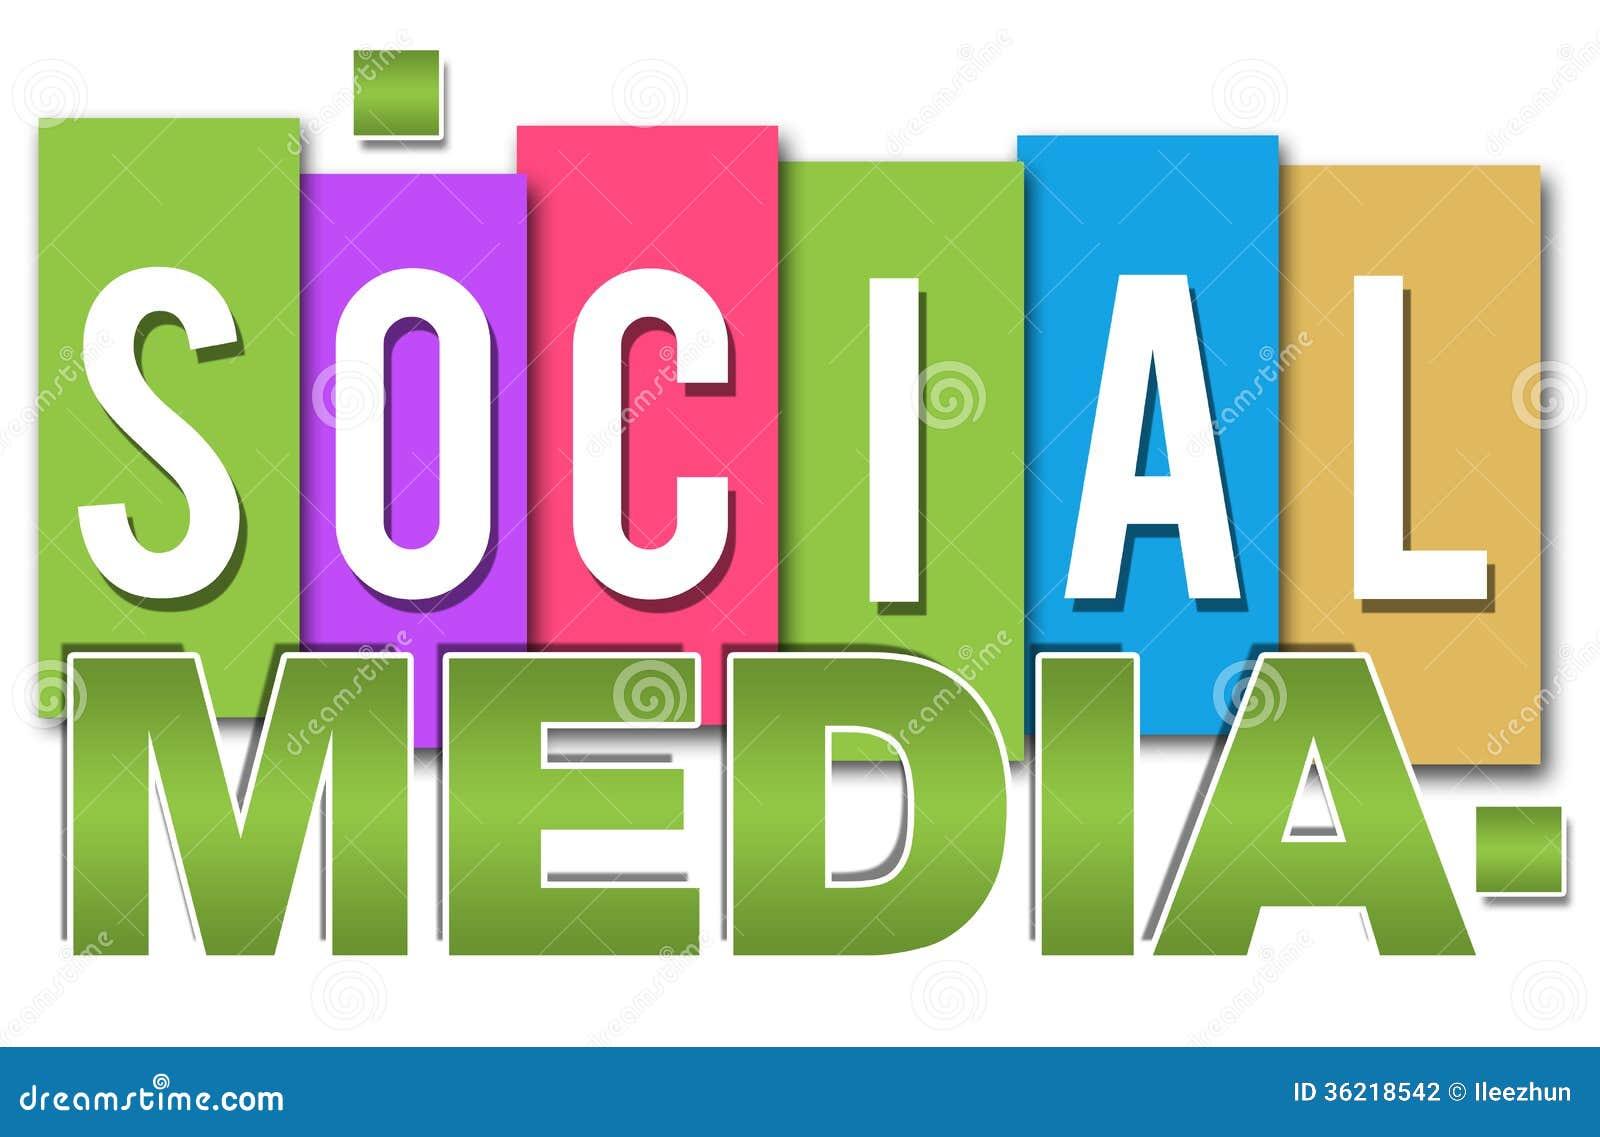 What is a media text? - Tony Fahy